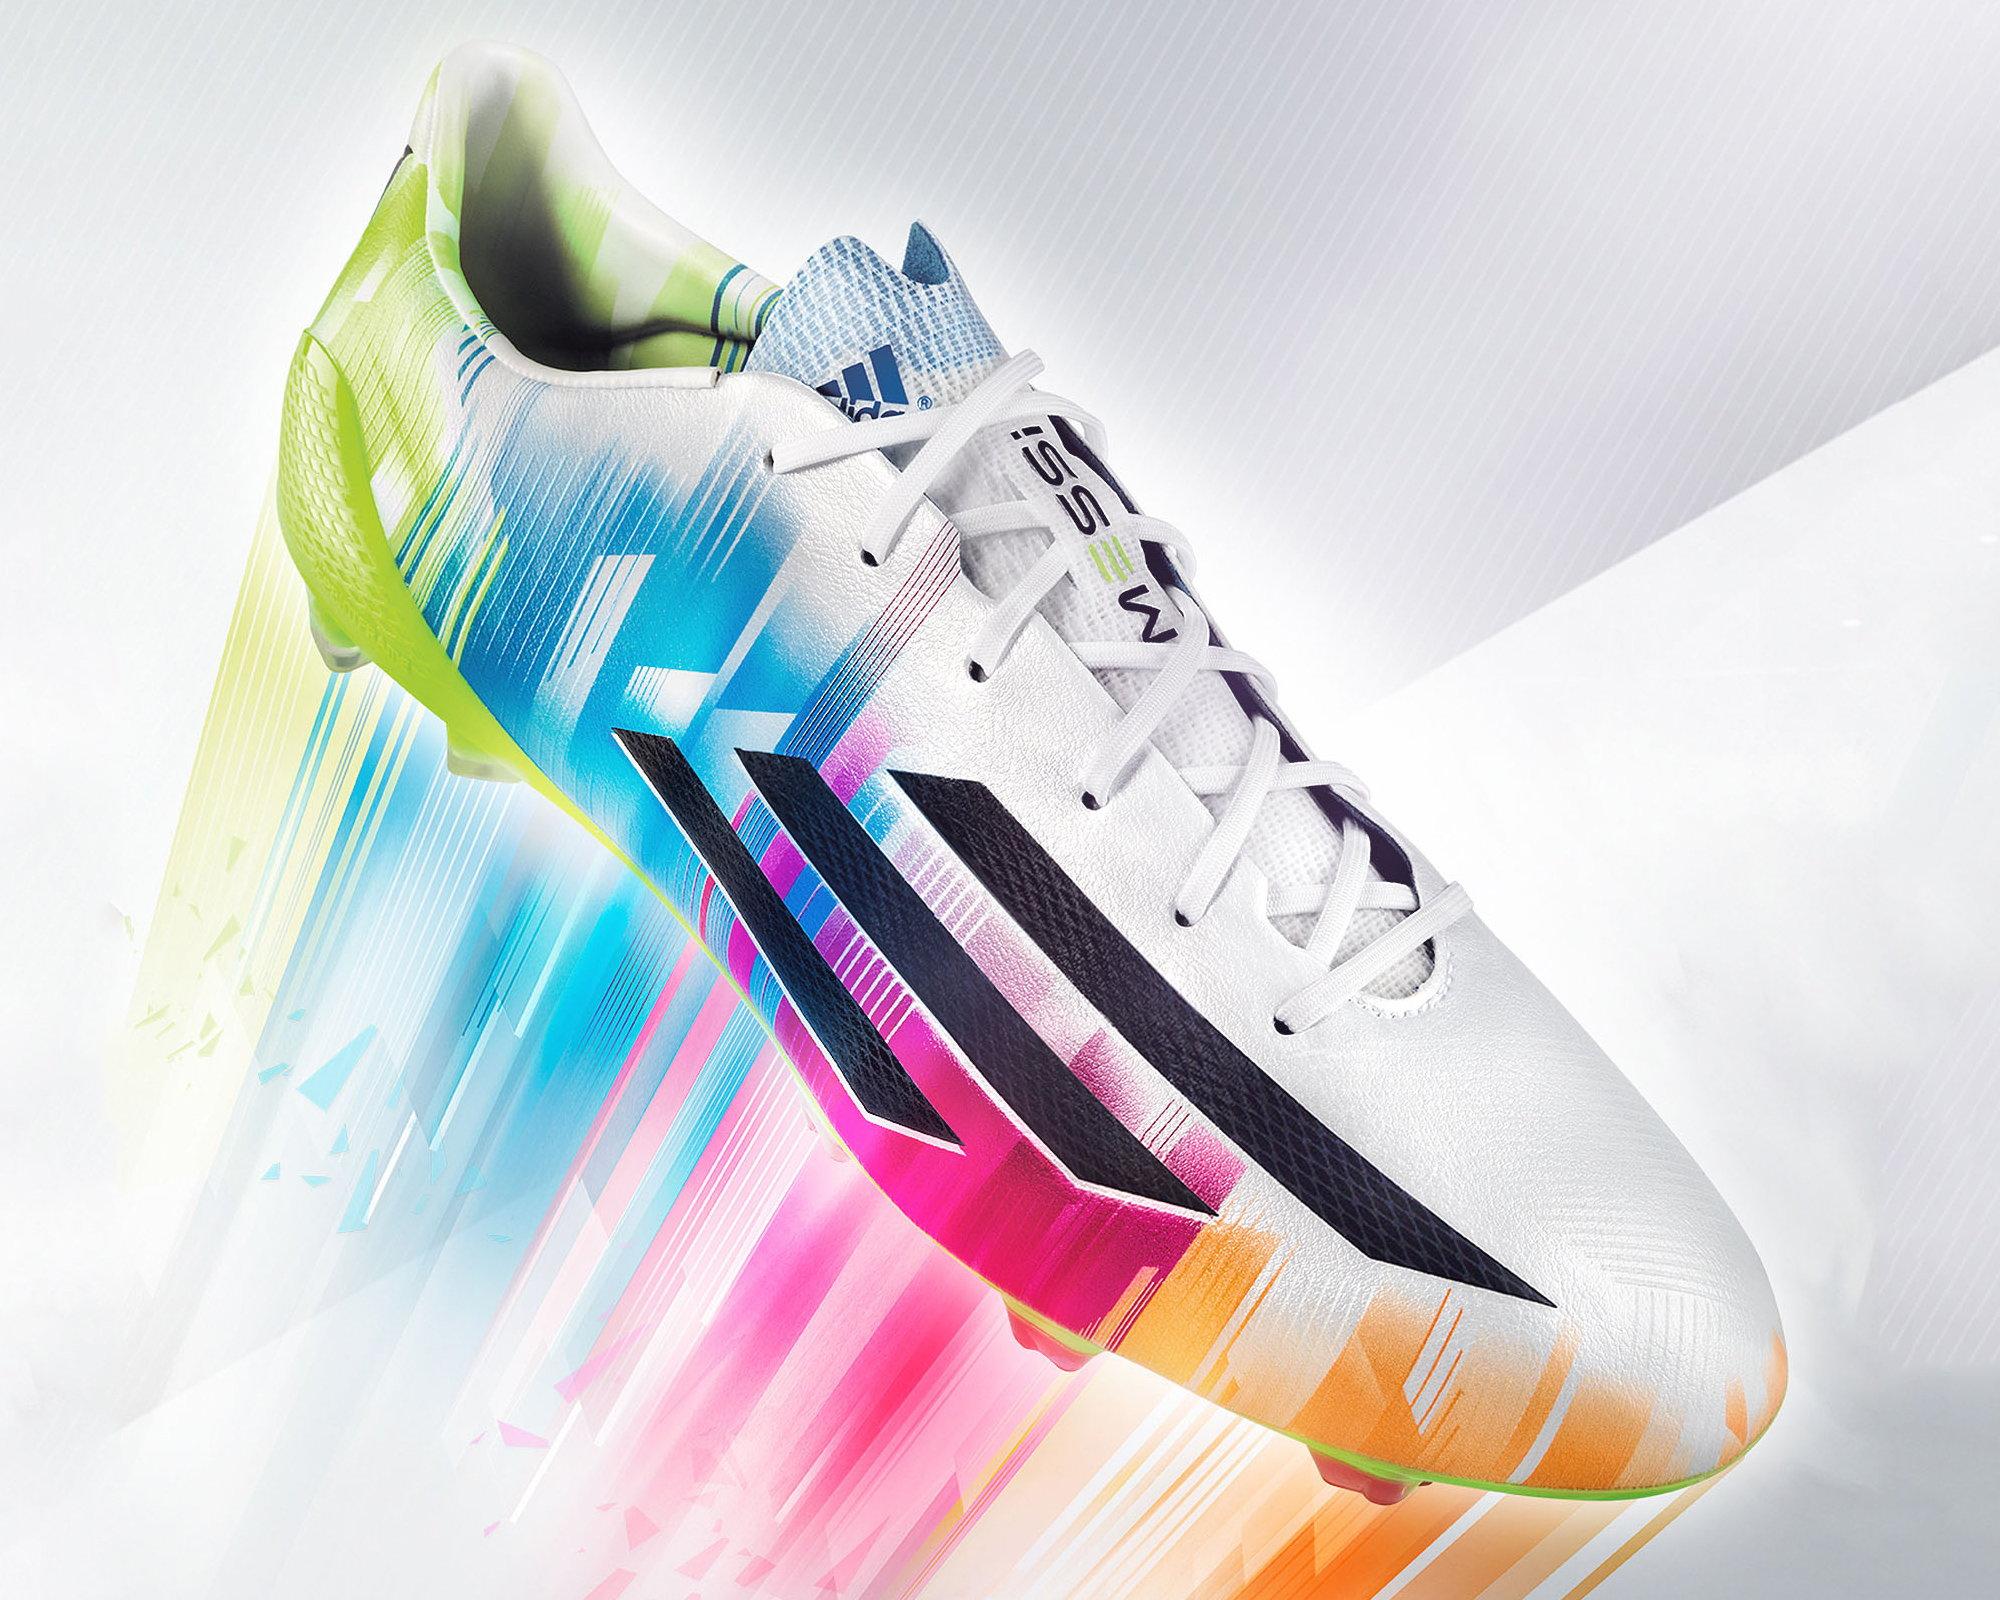 designer fashion edae8 1a1b6 New Adizero F50 Leo Messi Signature Cleat